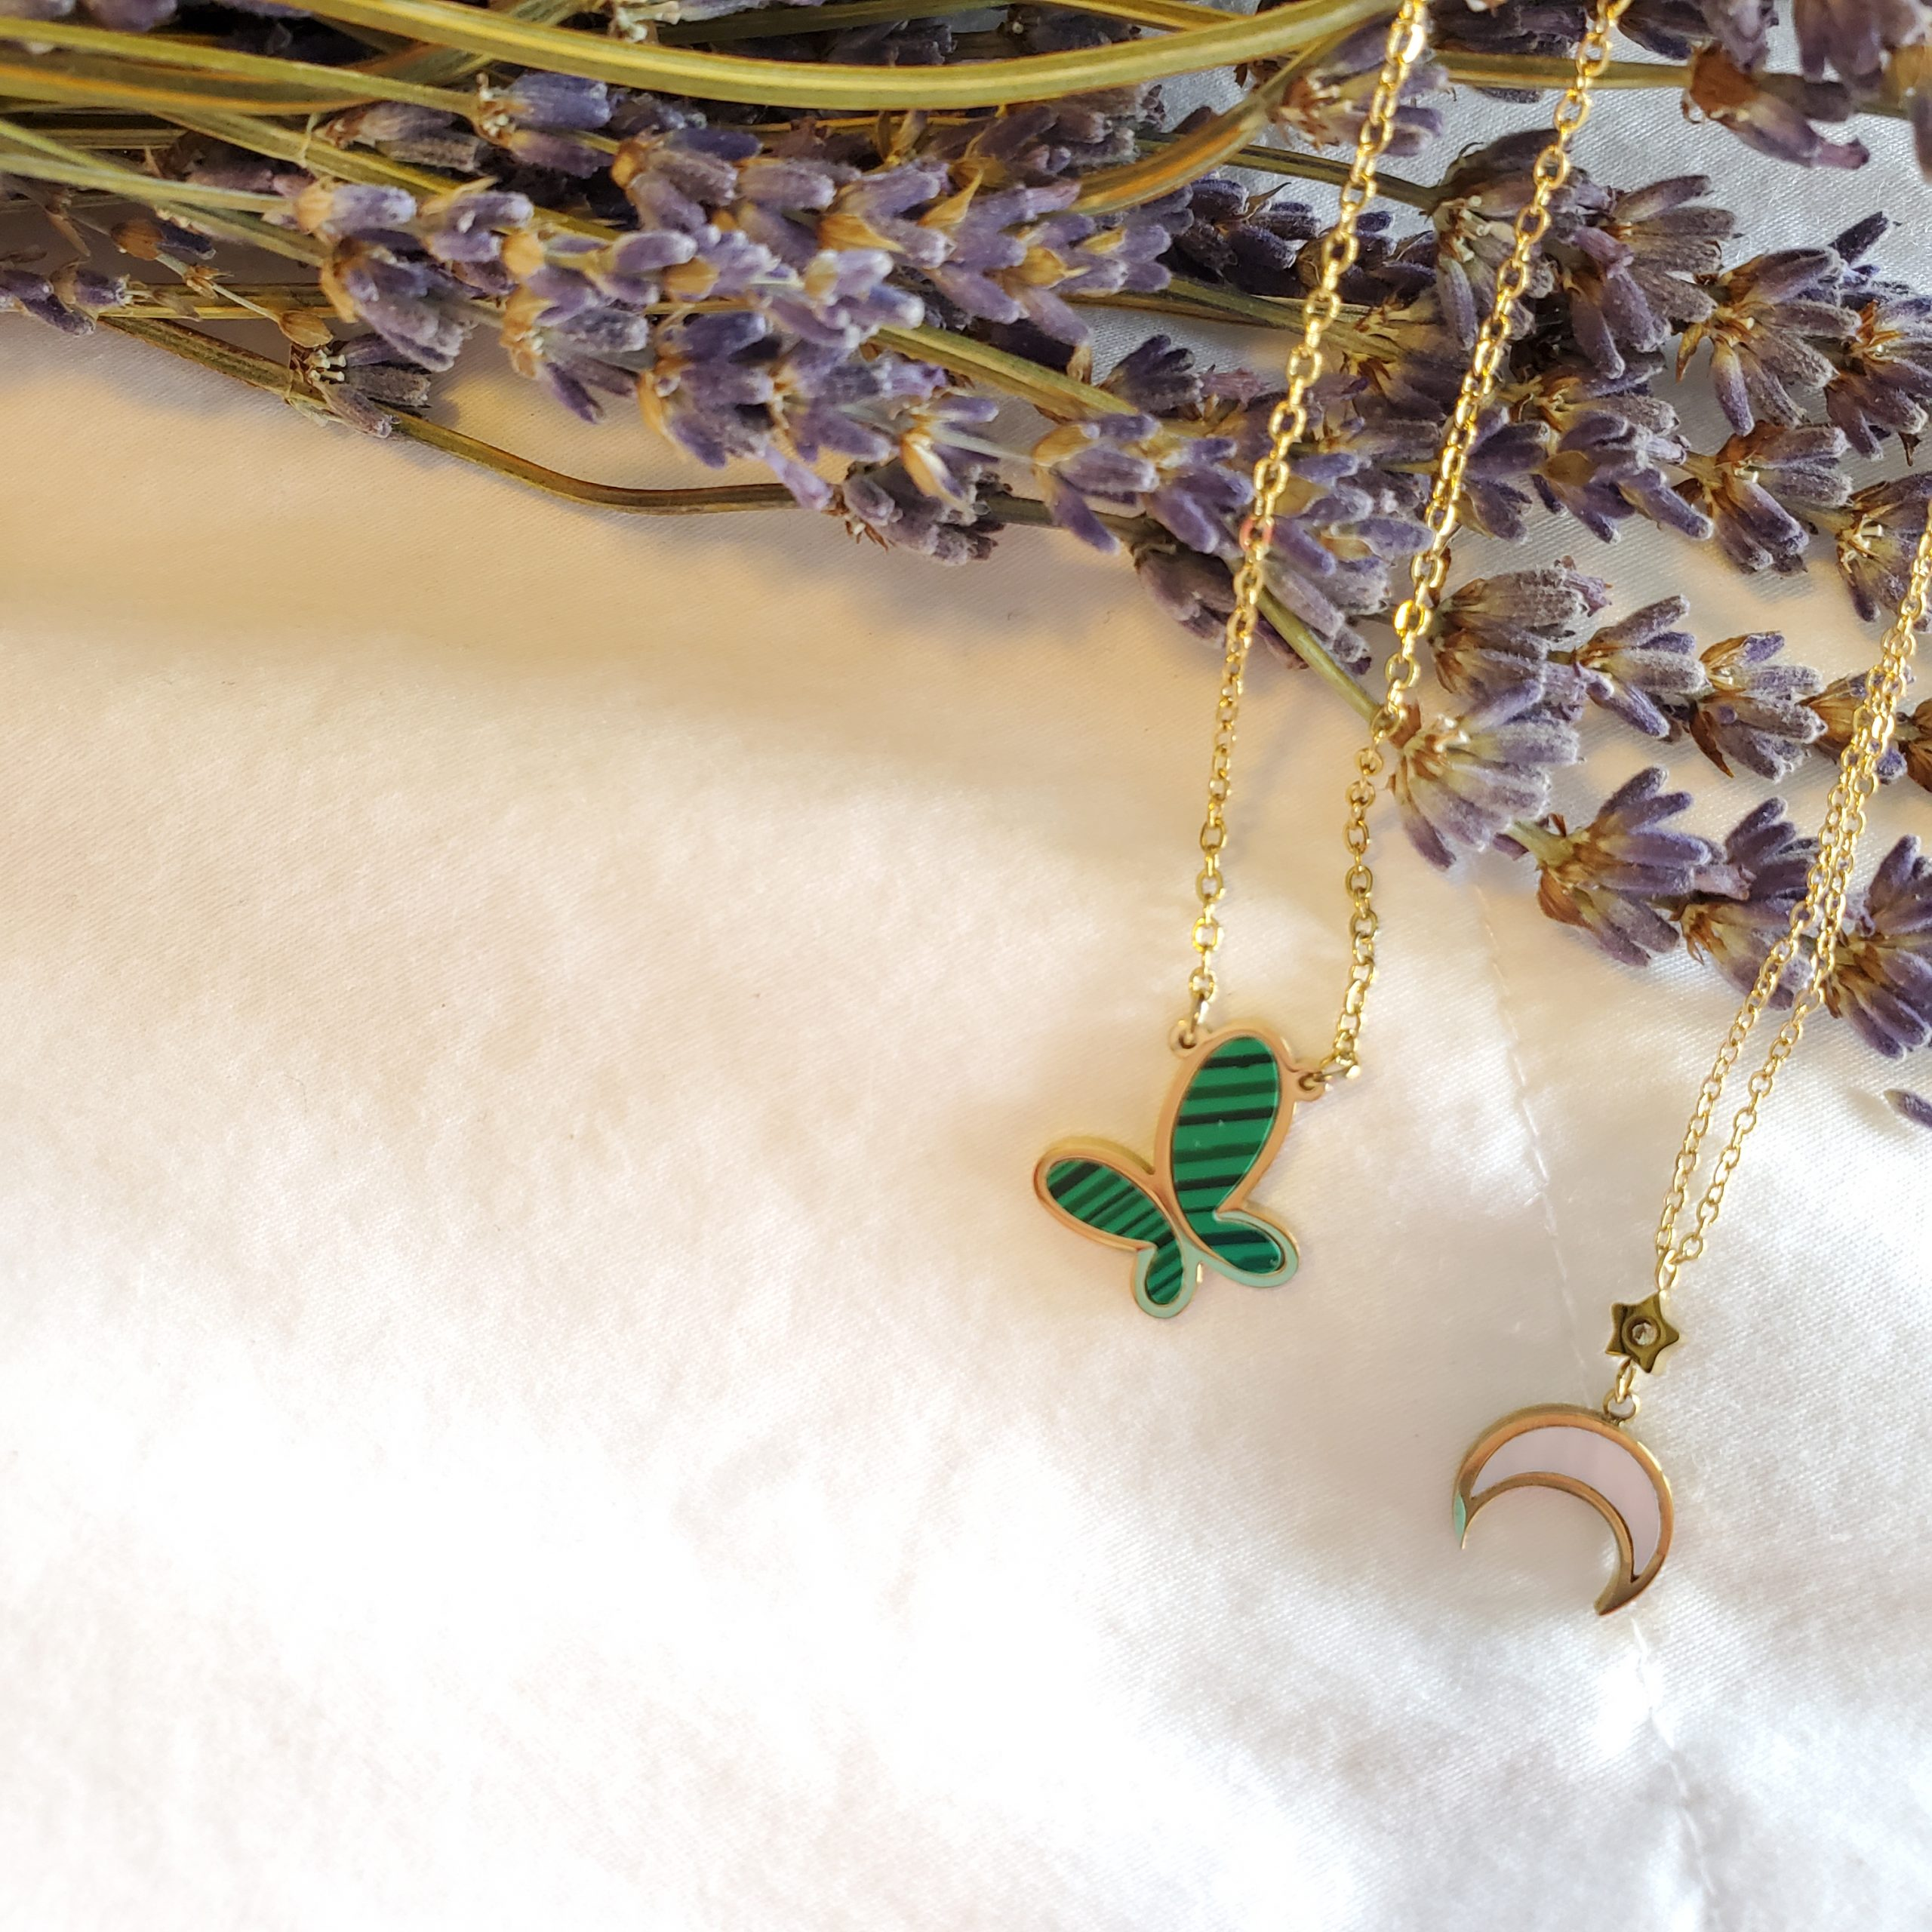 Necklaces/Chains